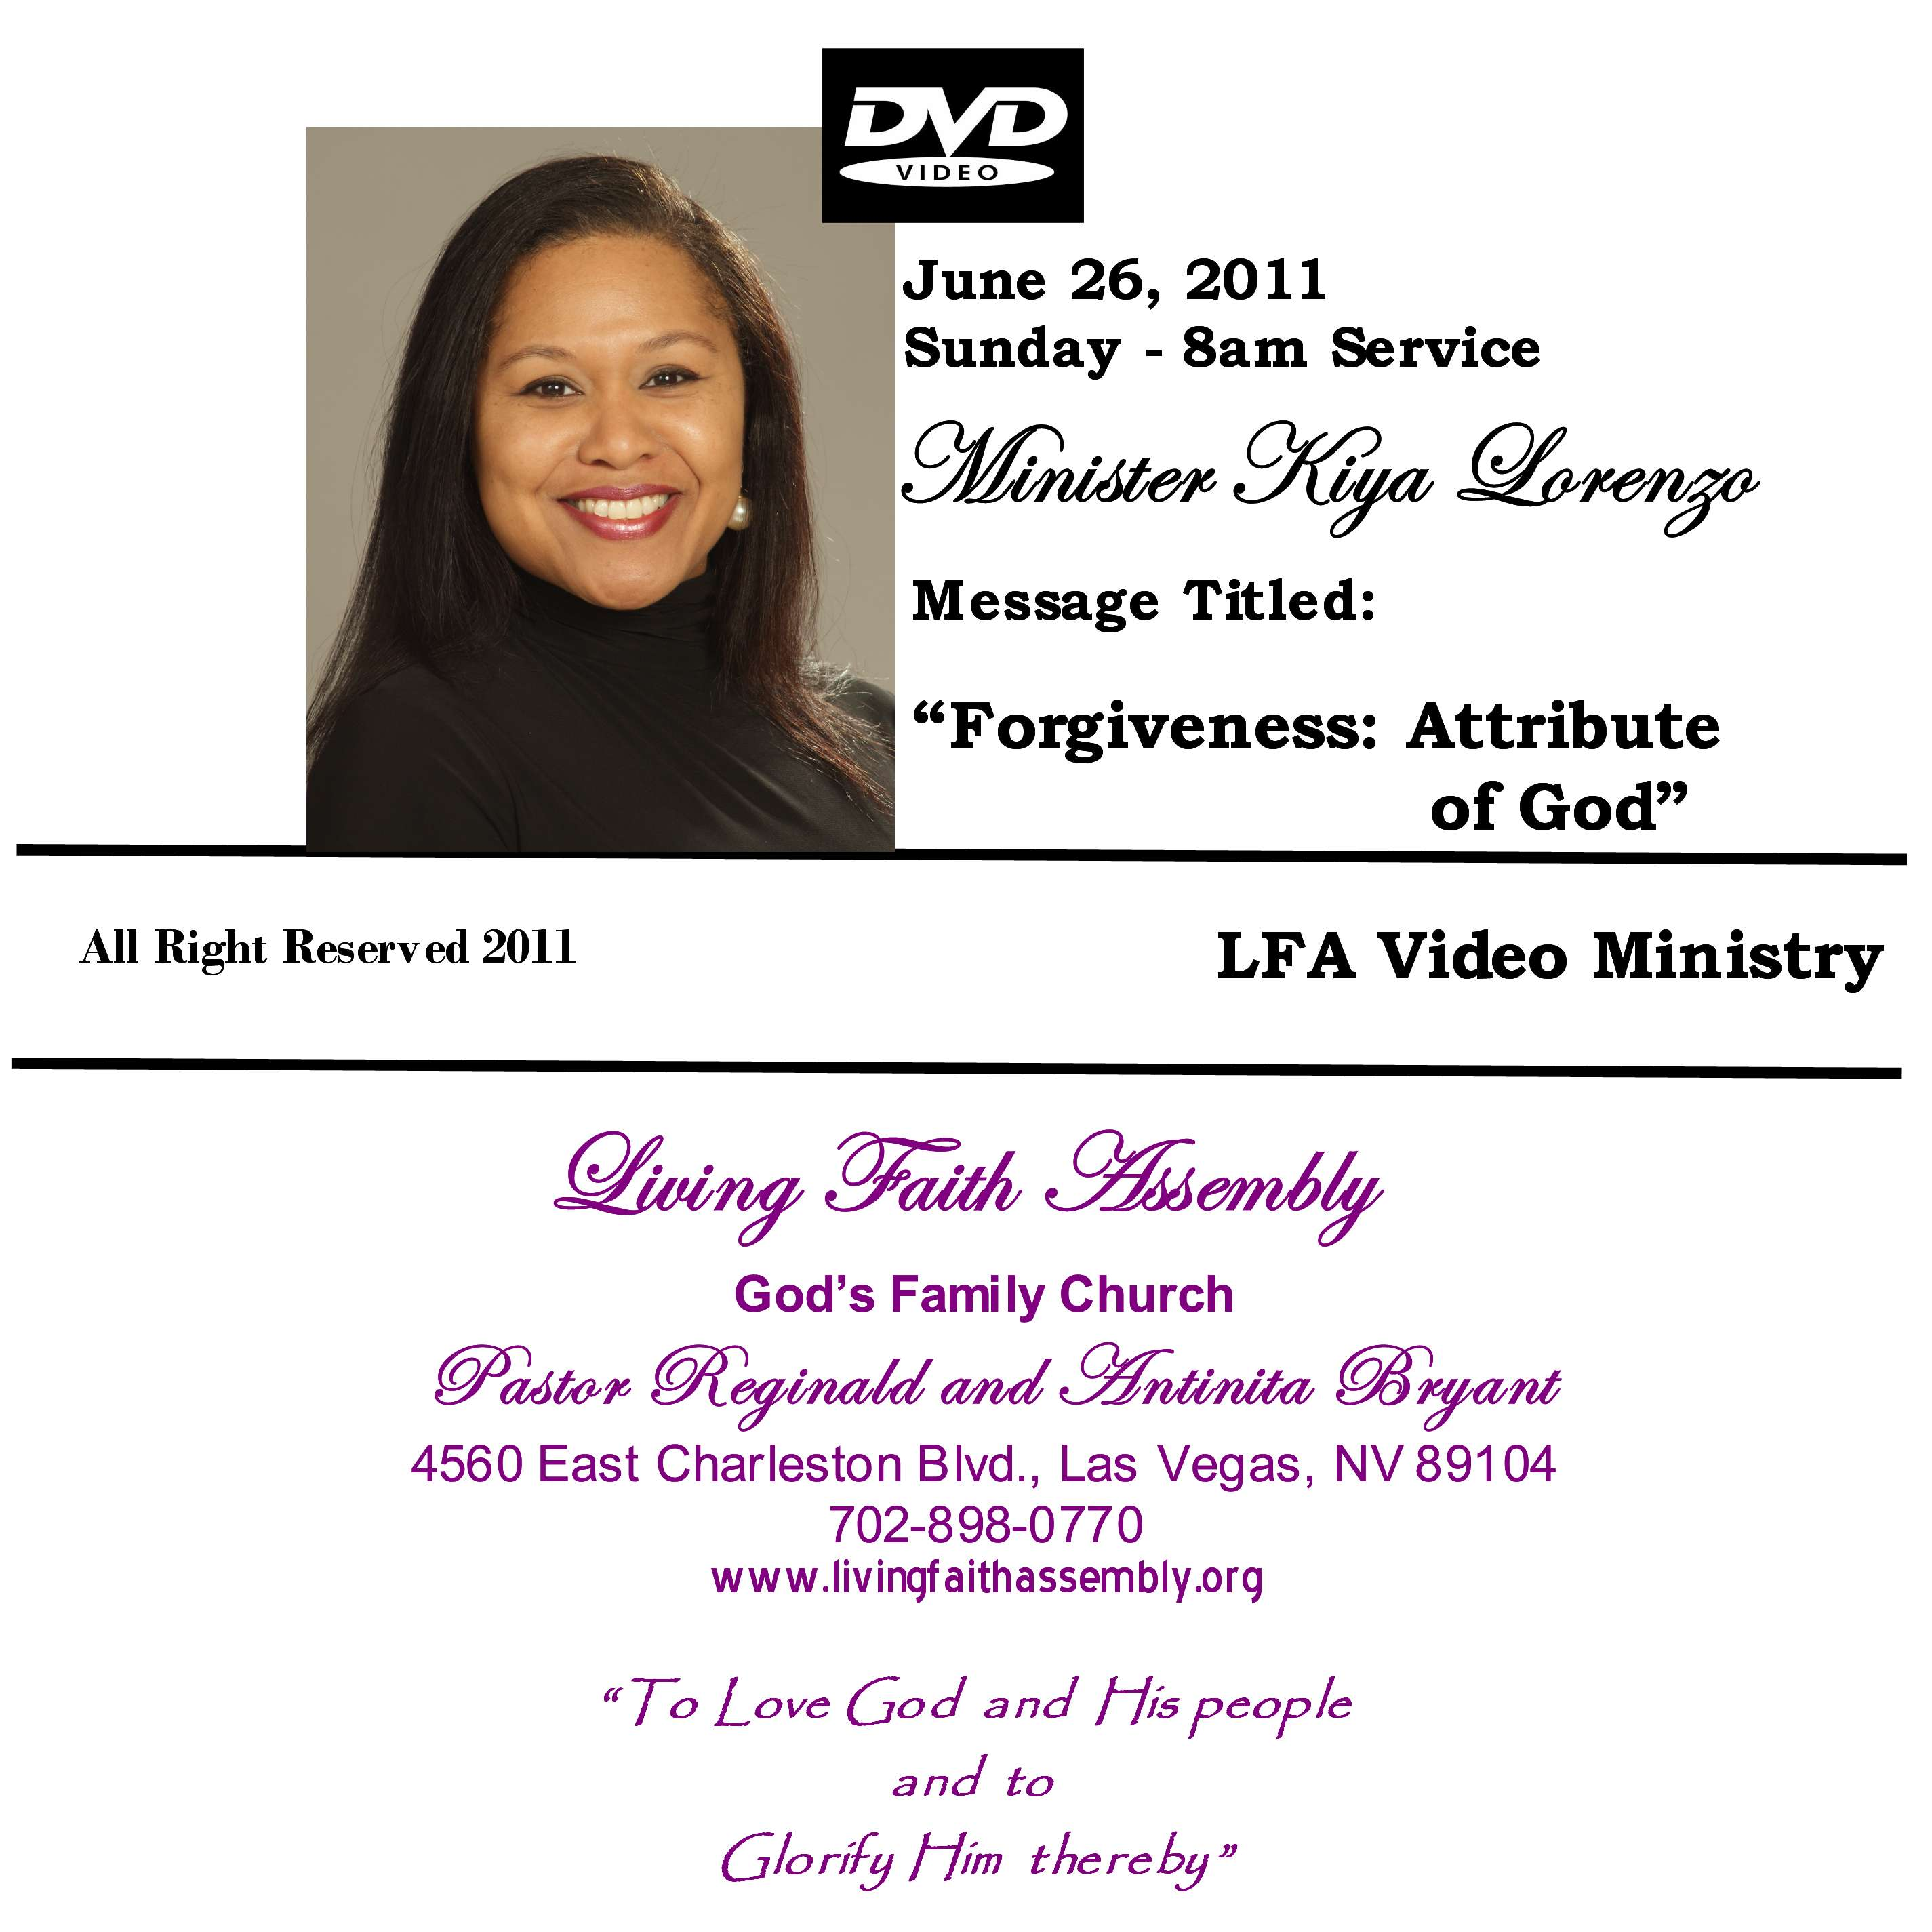 Forgiveness: Attribute of God - DVD